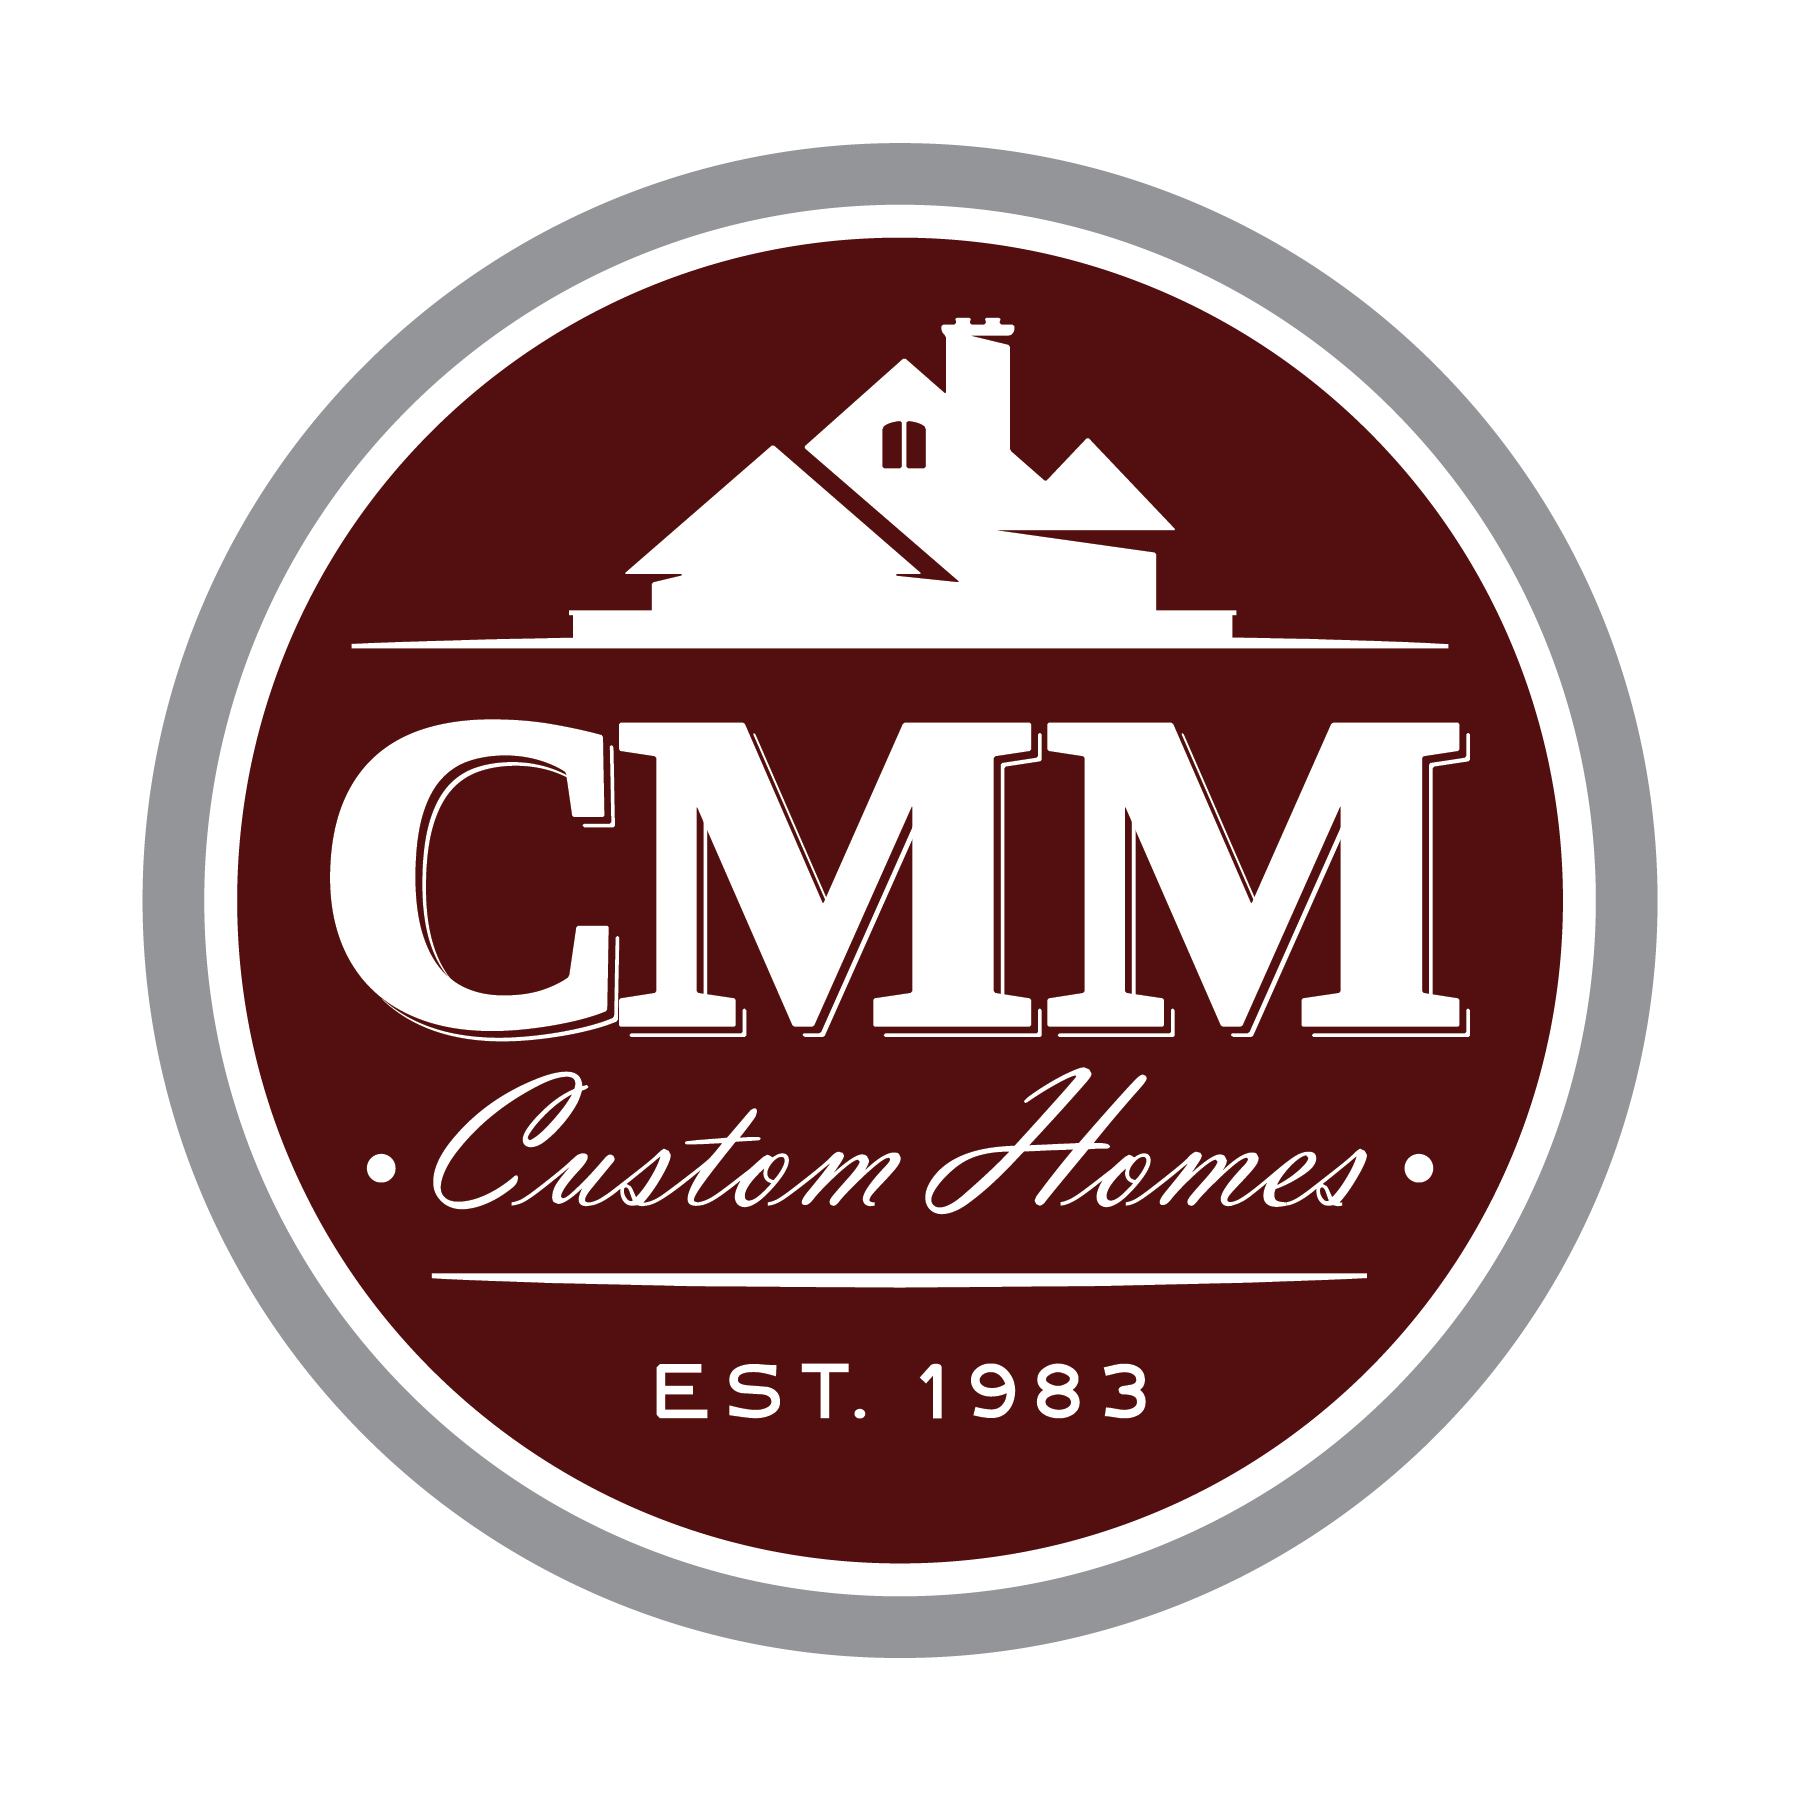 Luxury Home Builders Nj: CMM Custom Homes, Avon By The Sea New Jersey (NJ